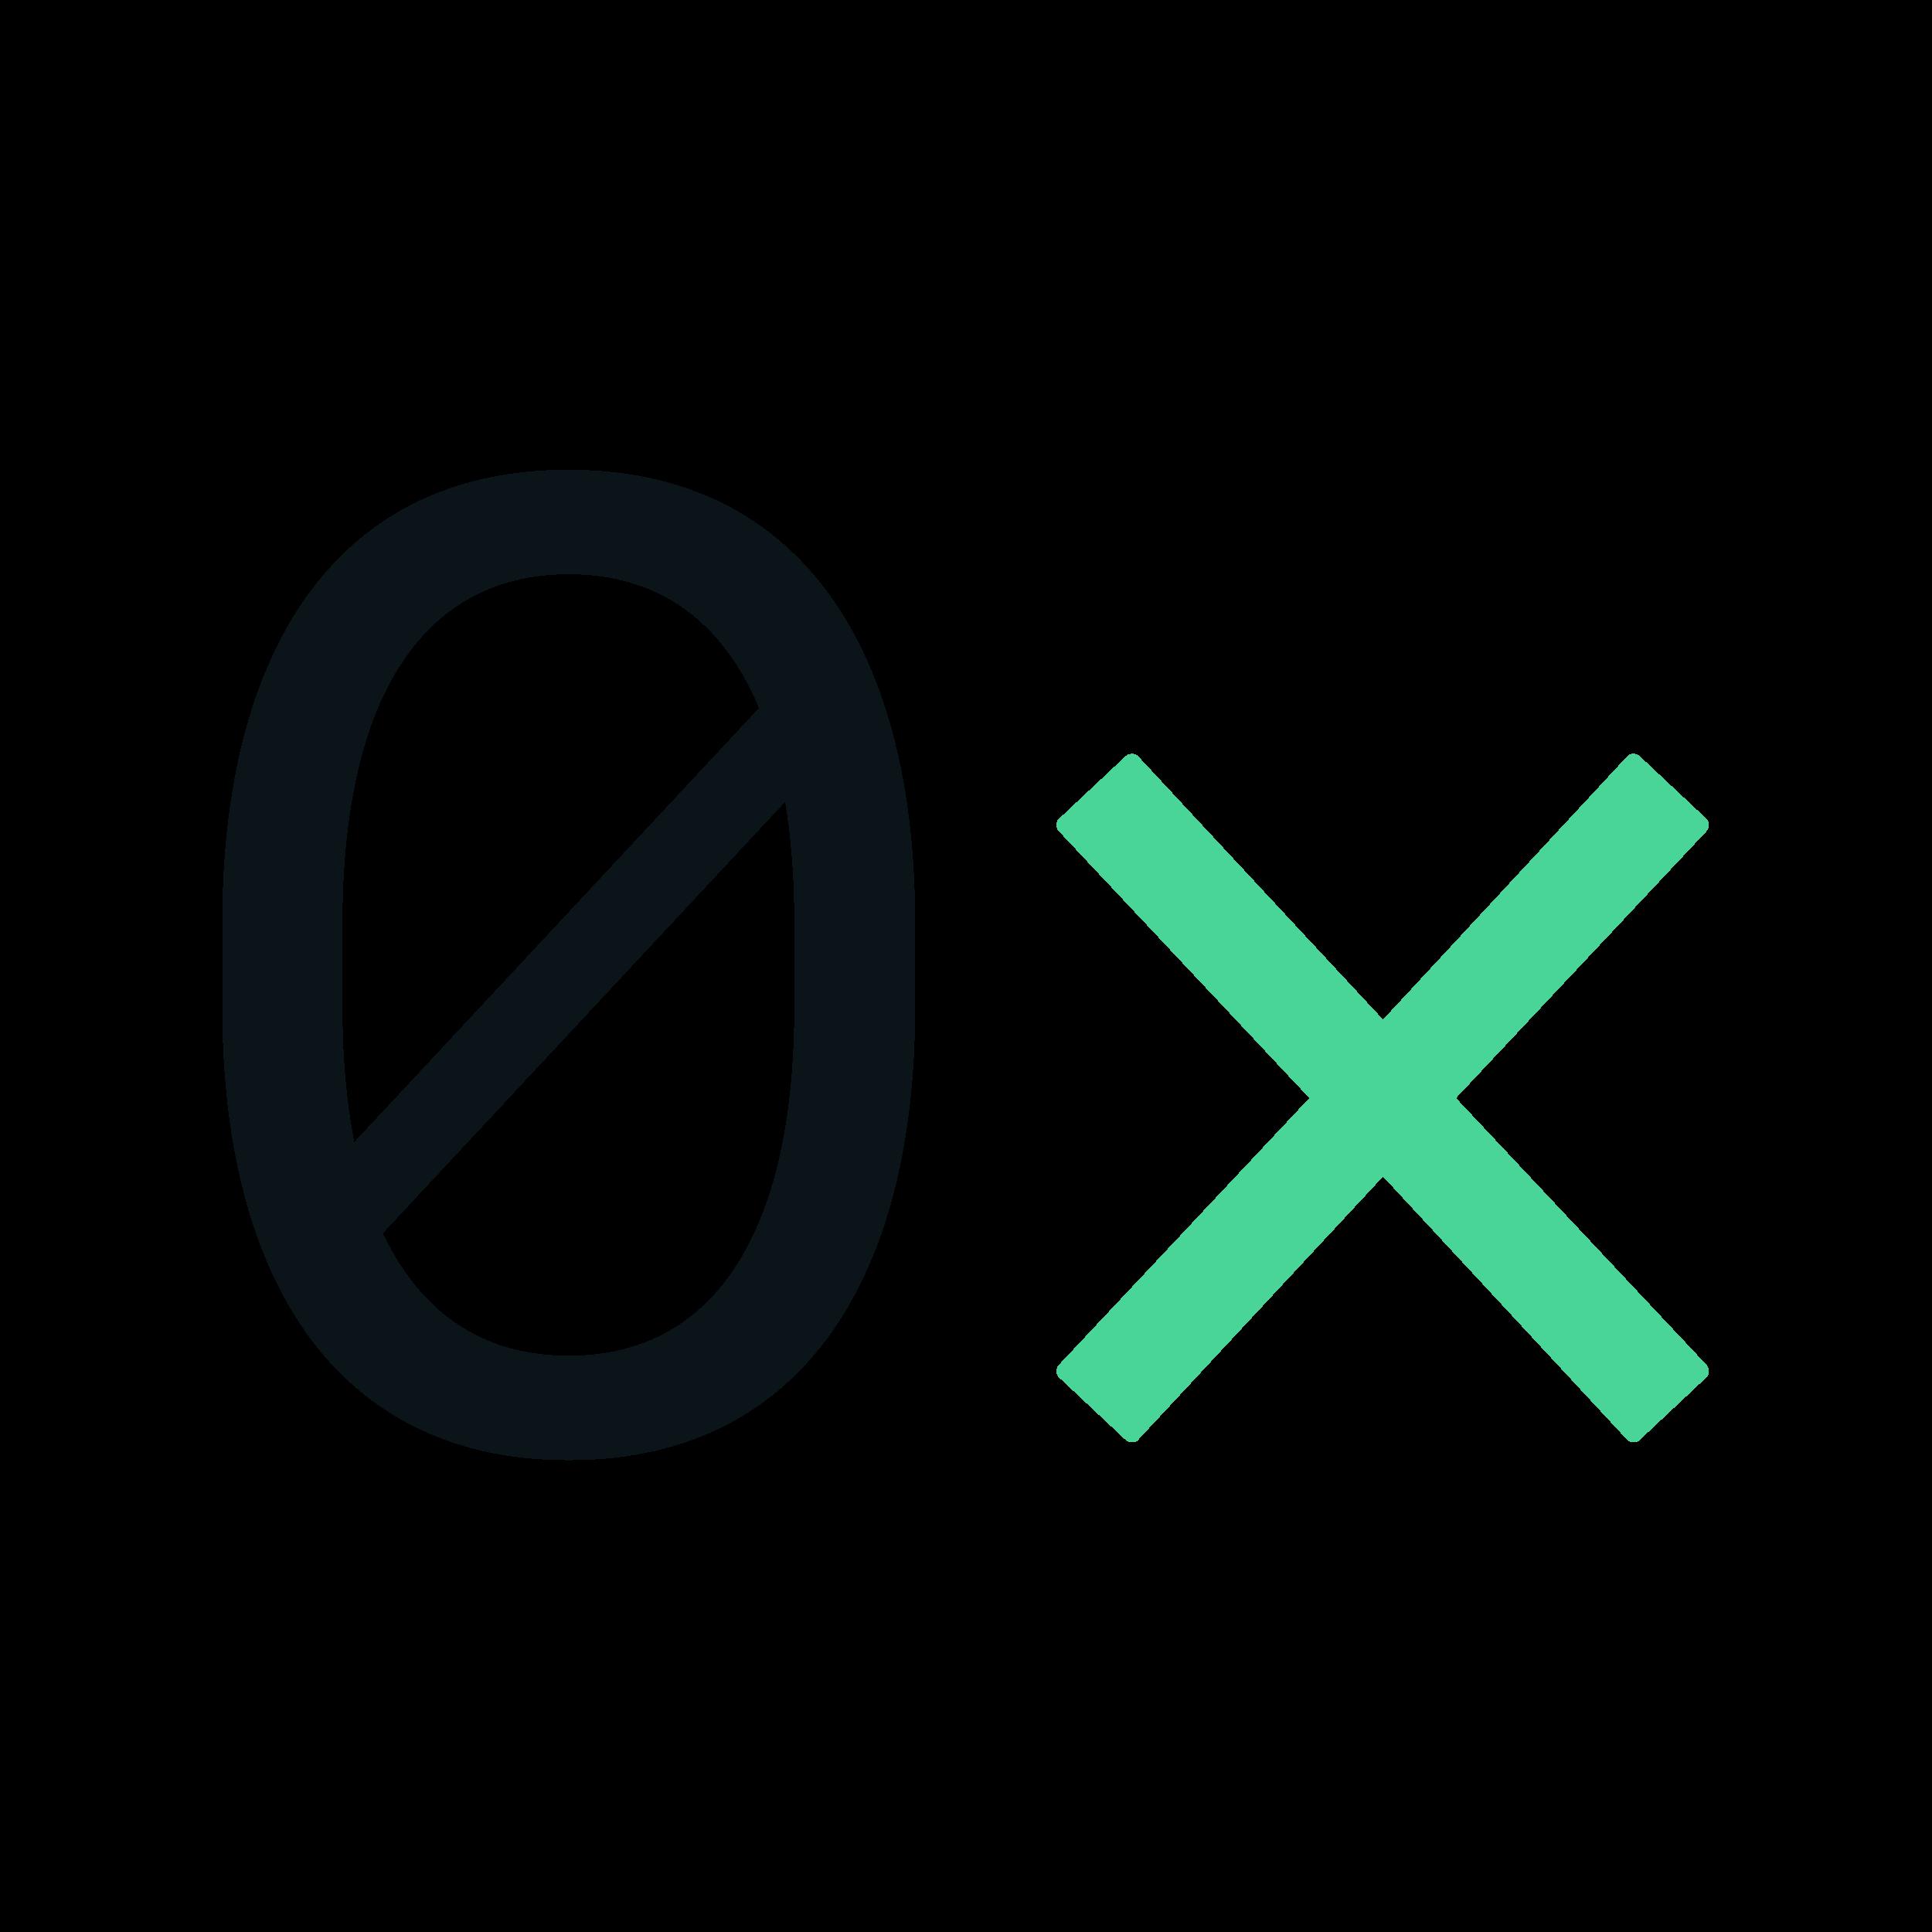 Oxide Computer Company